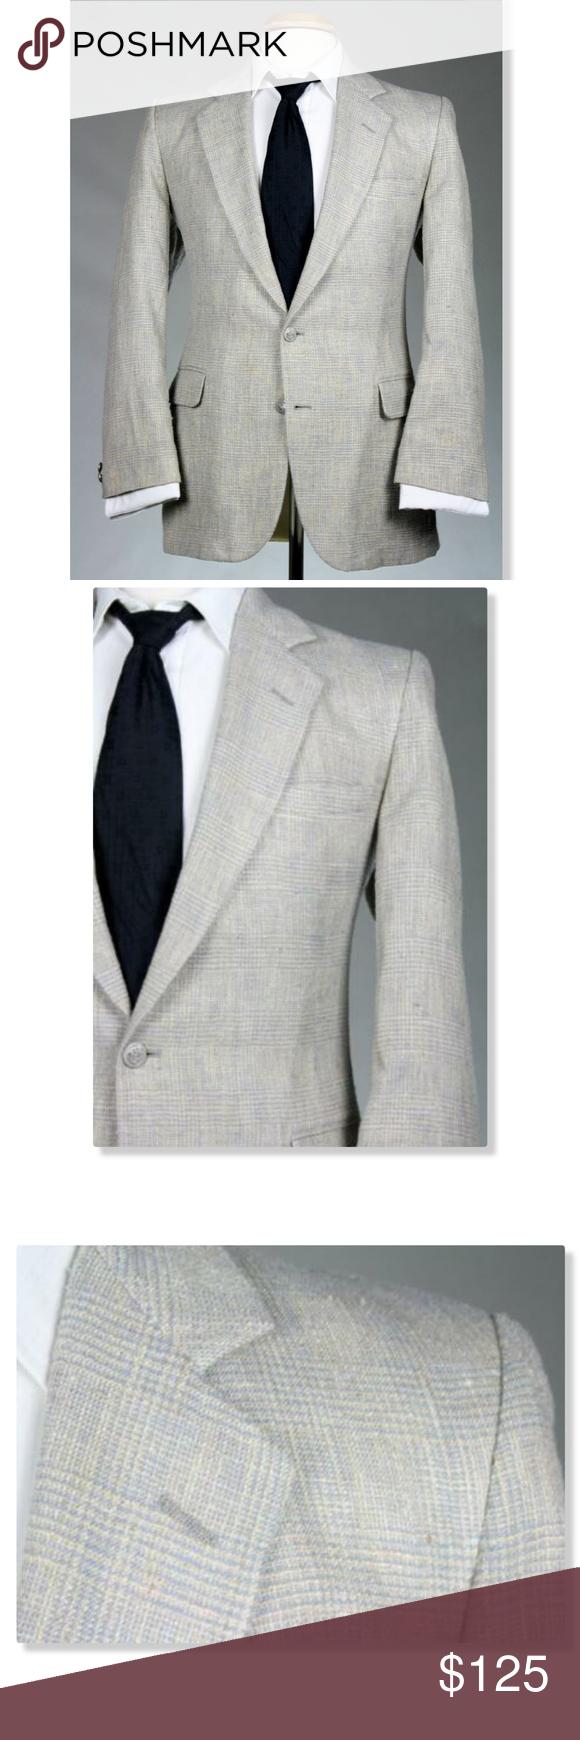 Vintage Grey Wool Blazer  34 chest  by Pierre Cardin